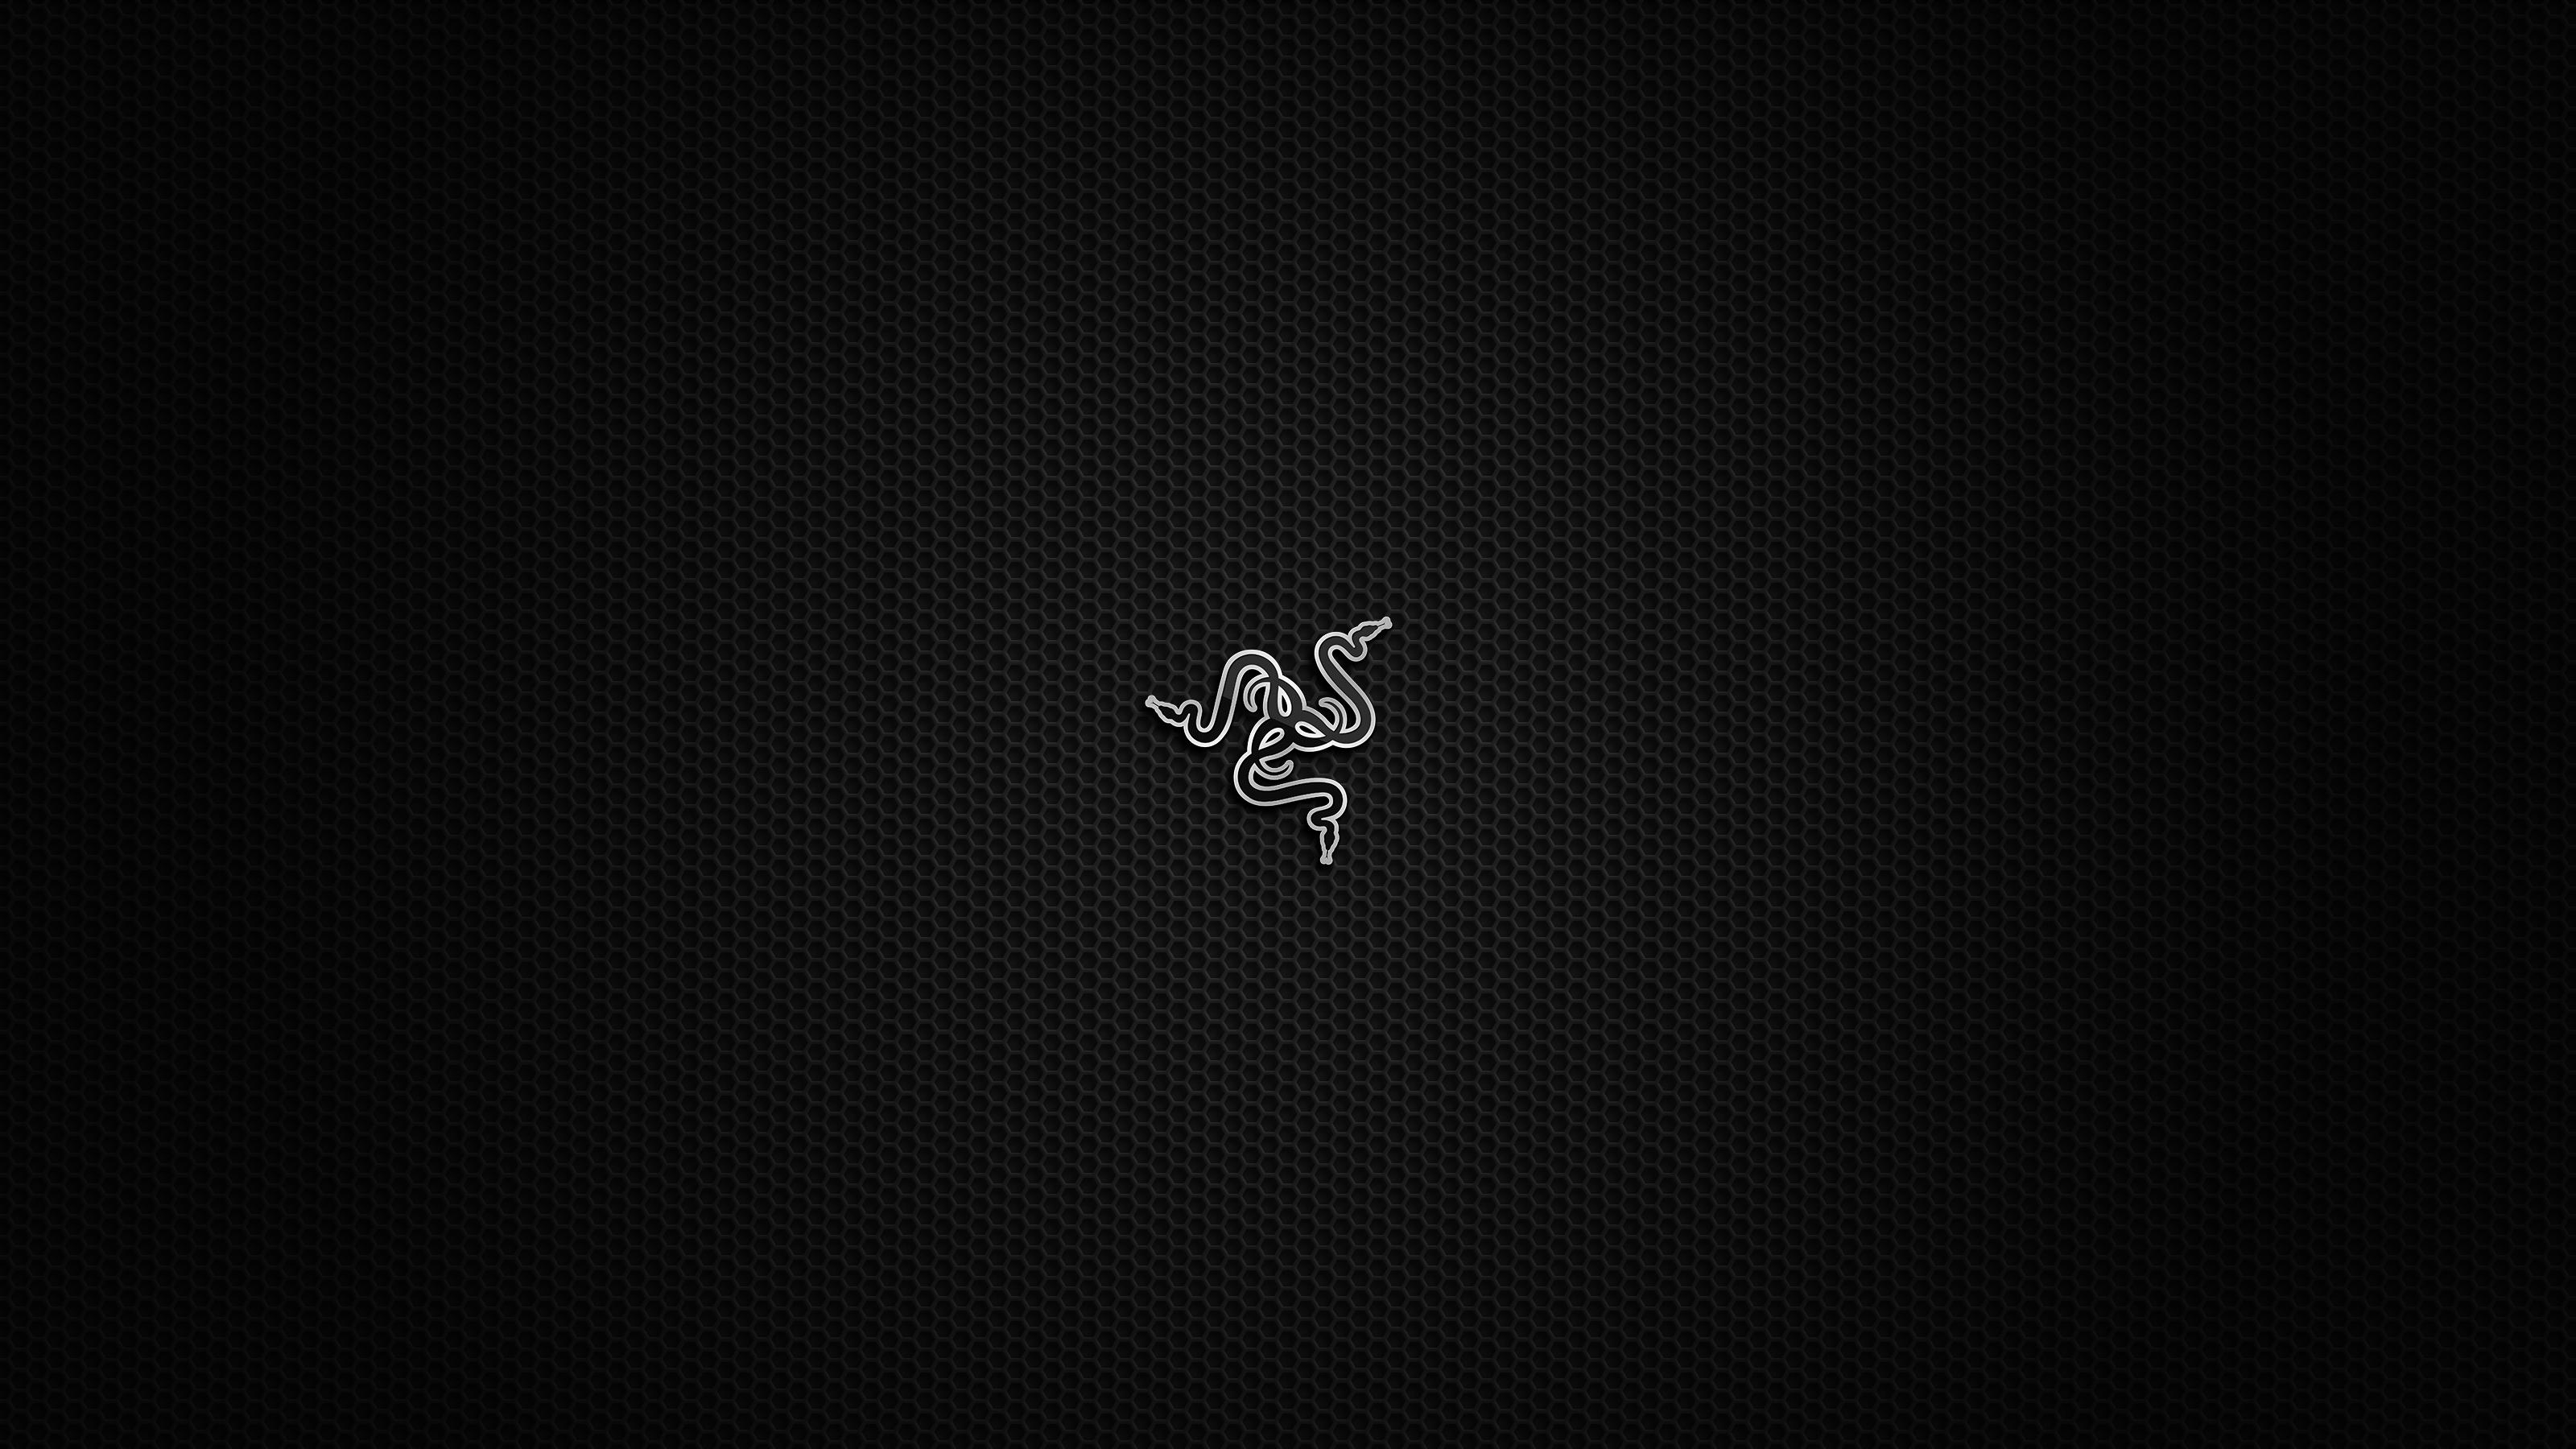 Razer Logo Wallpapers Top Free Razer Logo Backgrounds